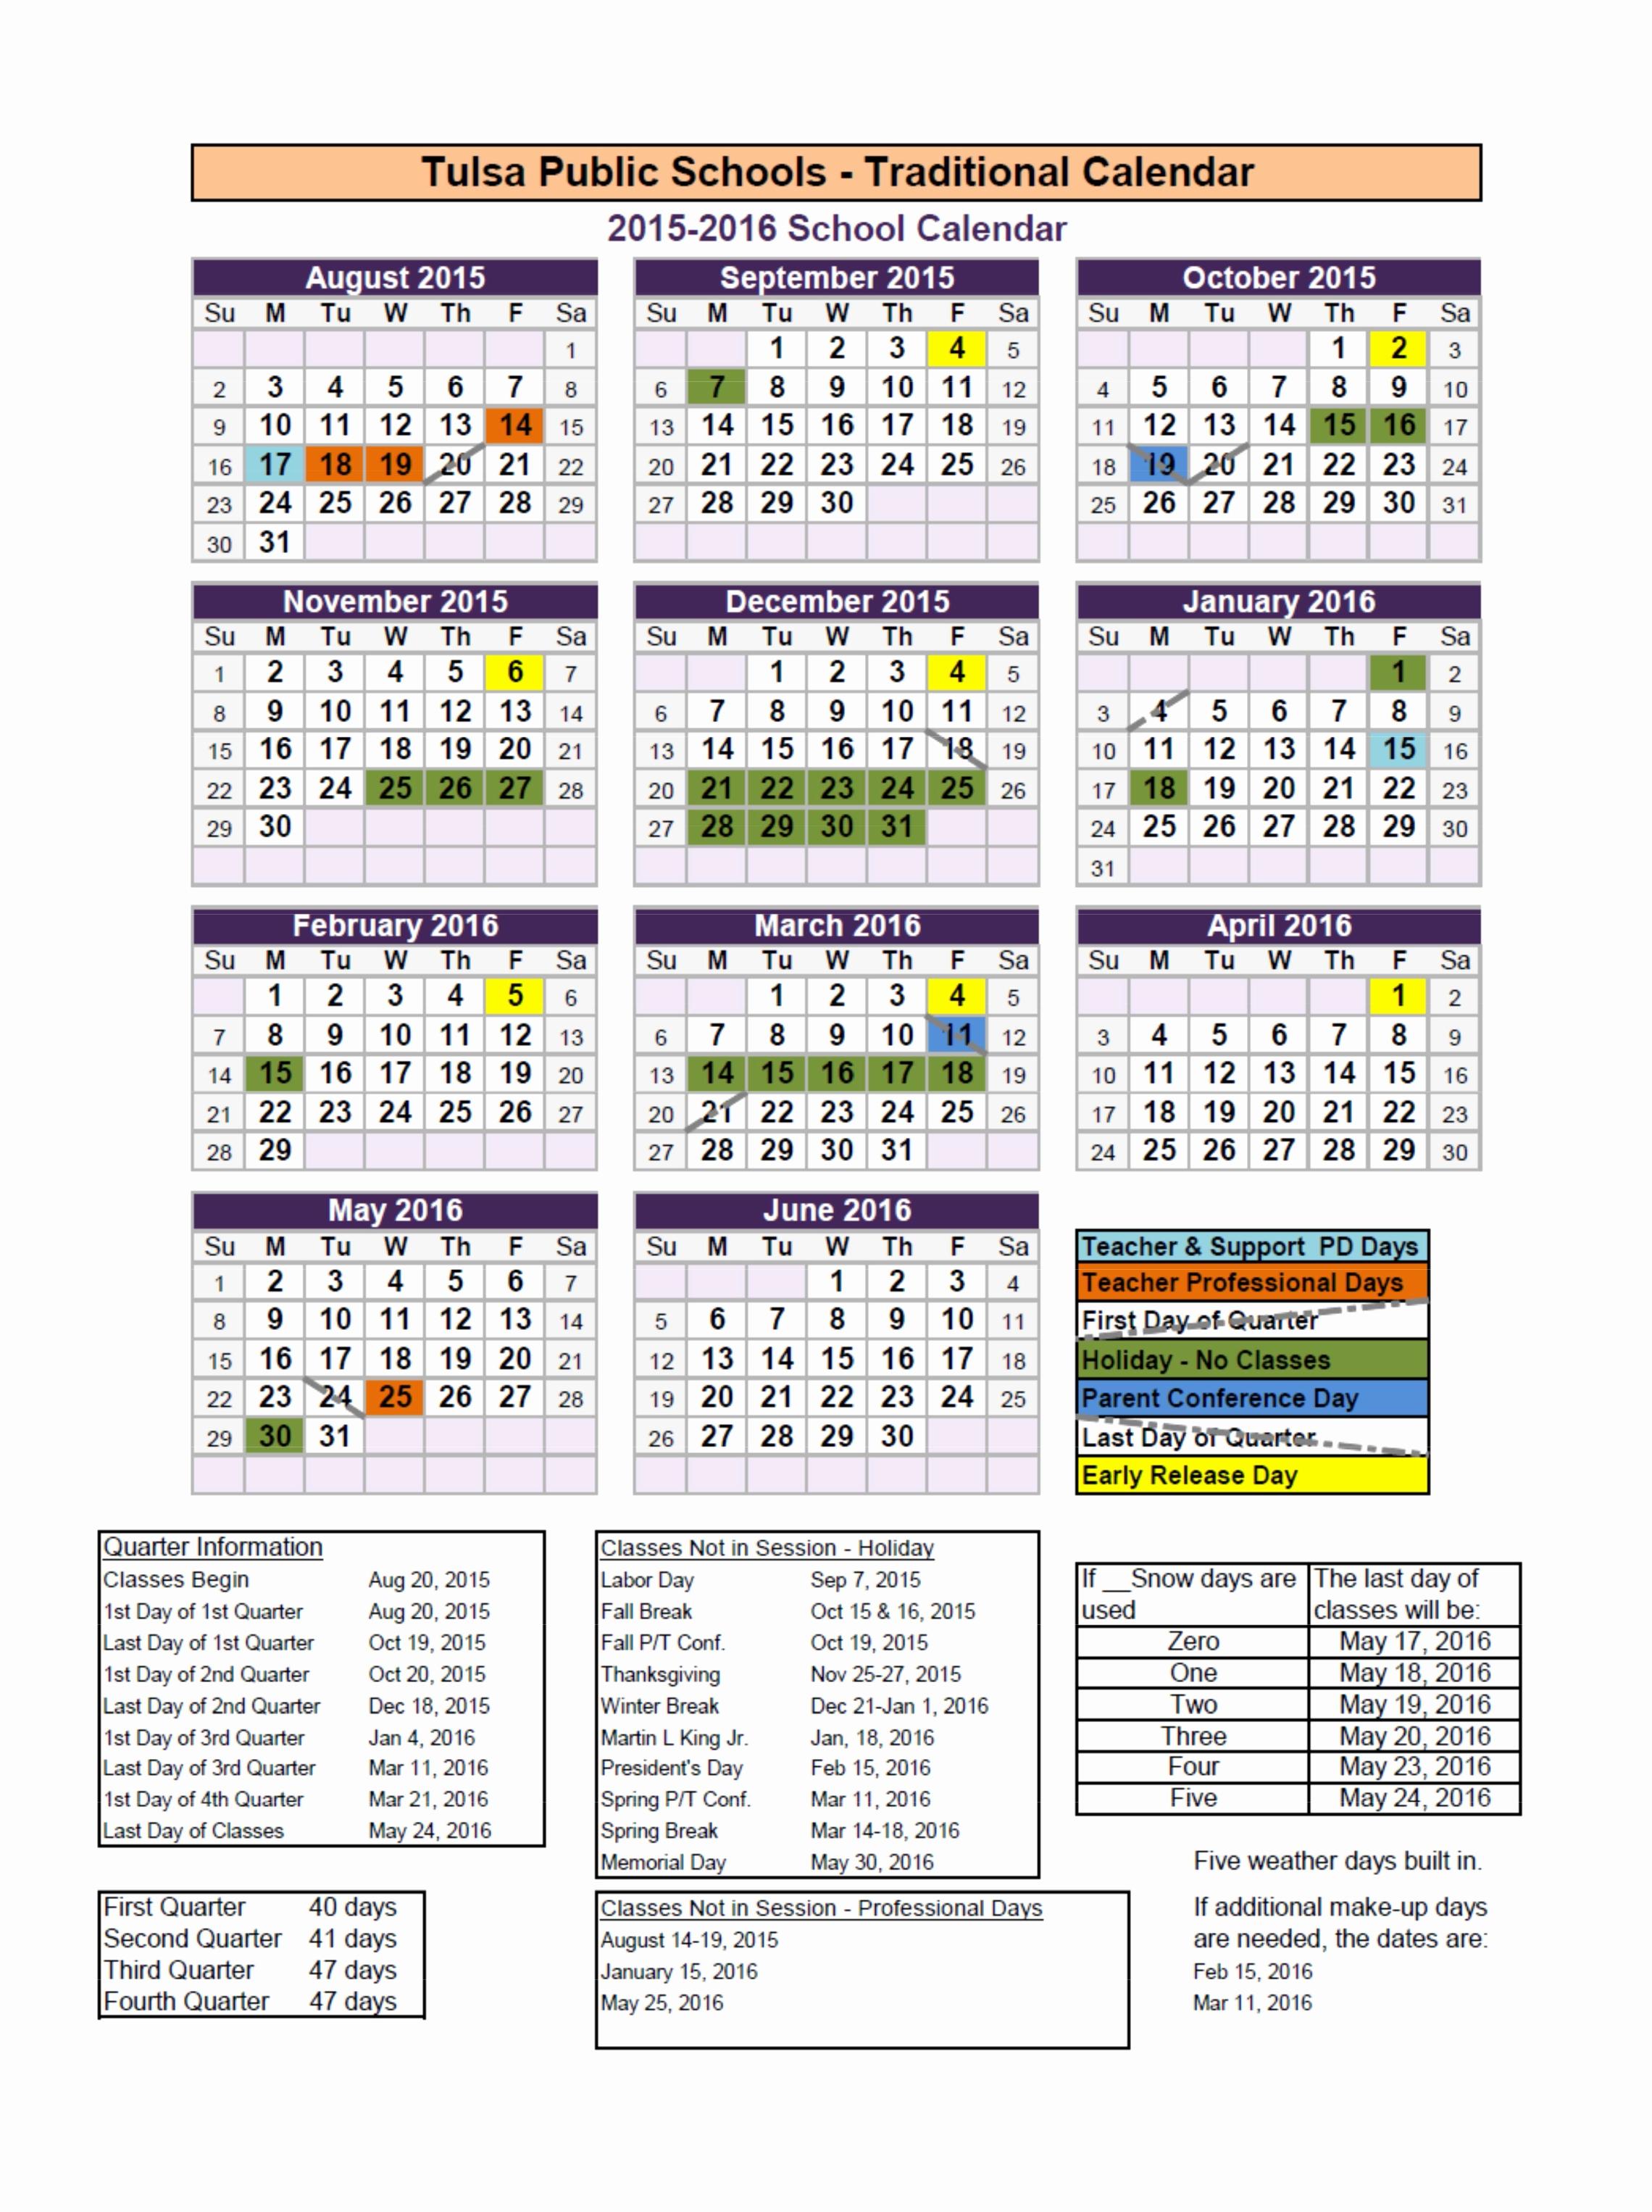 Broward School Calendar 2019 Luxury School Year Calendar For 2018 17 School Calendar 2019-20 Broward